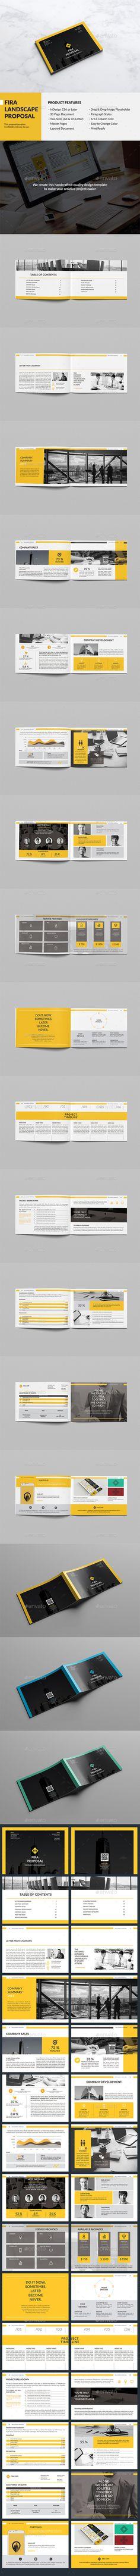 Invoice u2014 Photoshop PSD red psd u2022